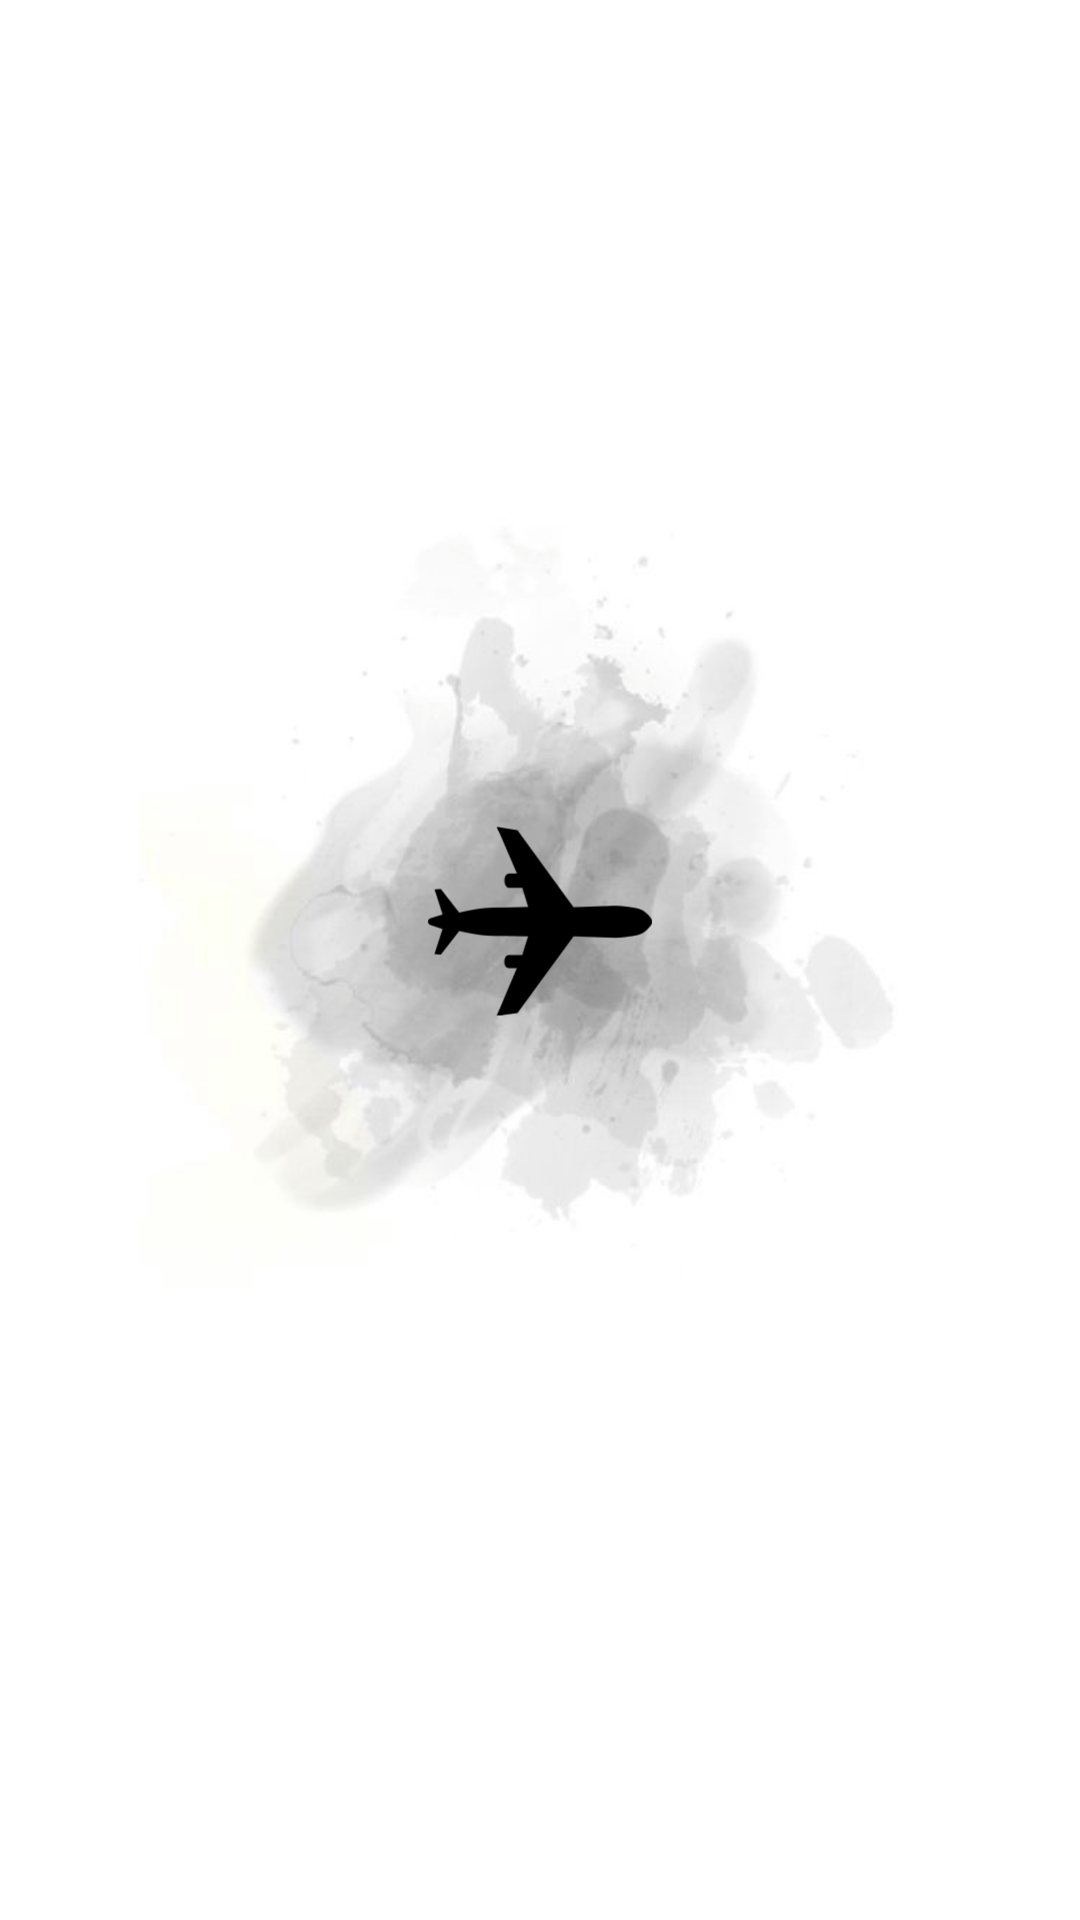 Black And Grey Logotipo Instagram Ideias Instagram Simbolo Do Instagram